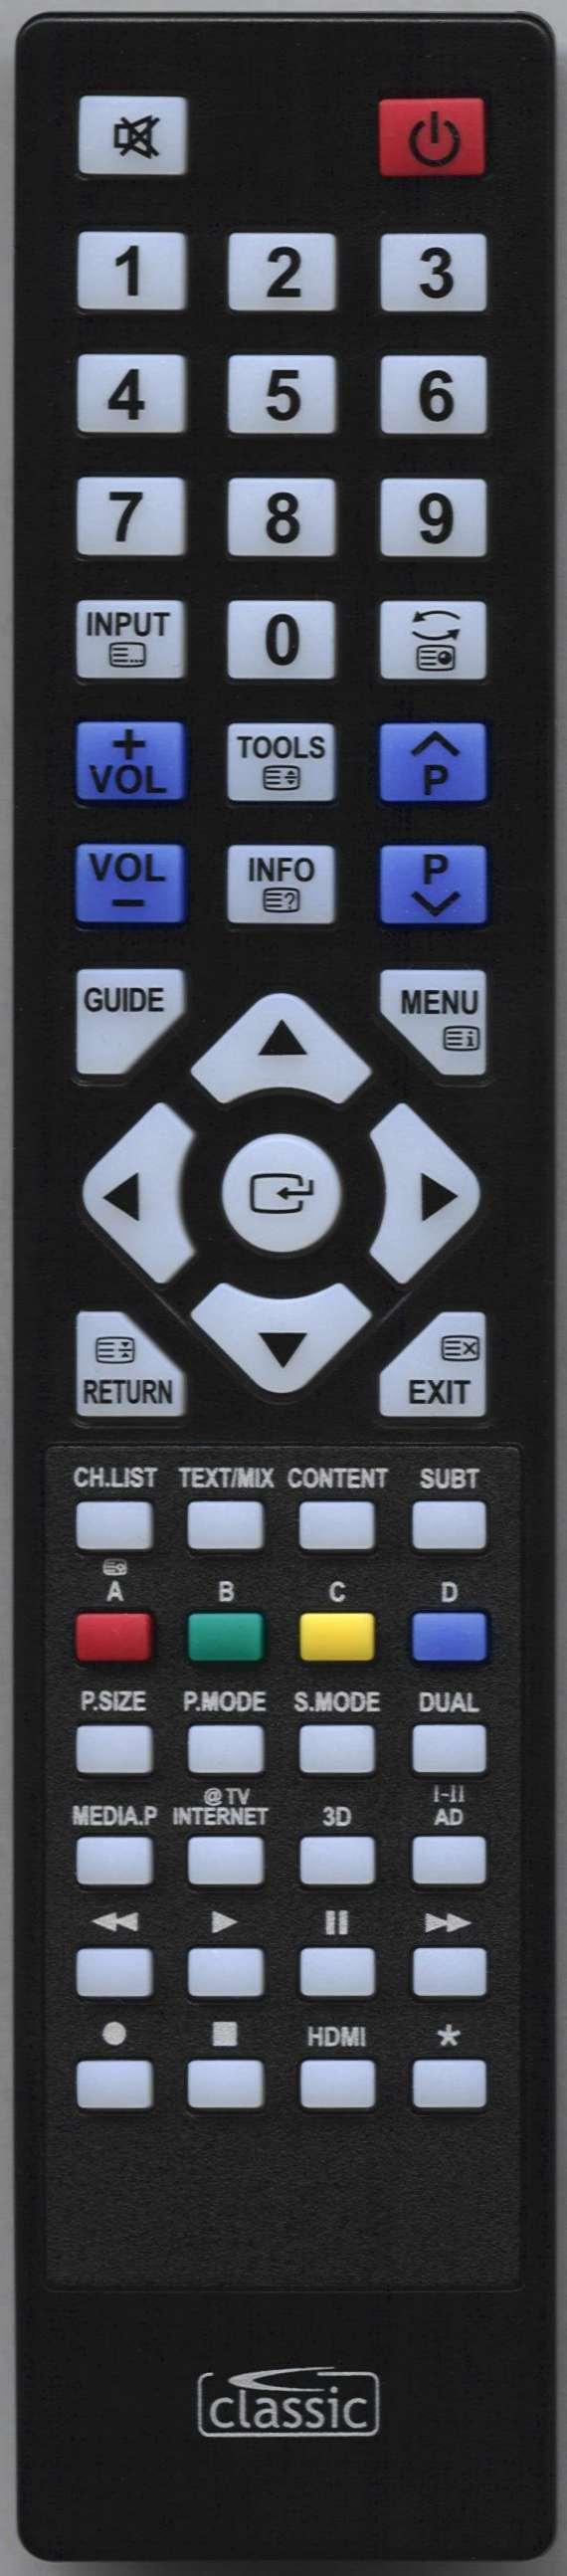 SAMSUNG UE32C4000PW Remote Control Alternative